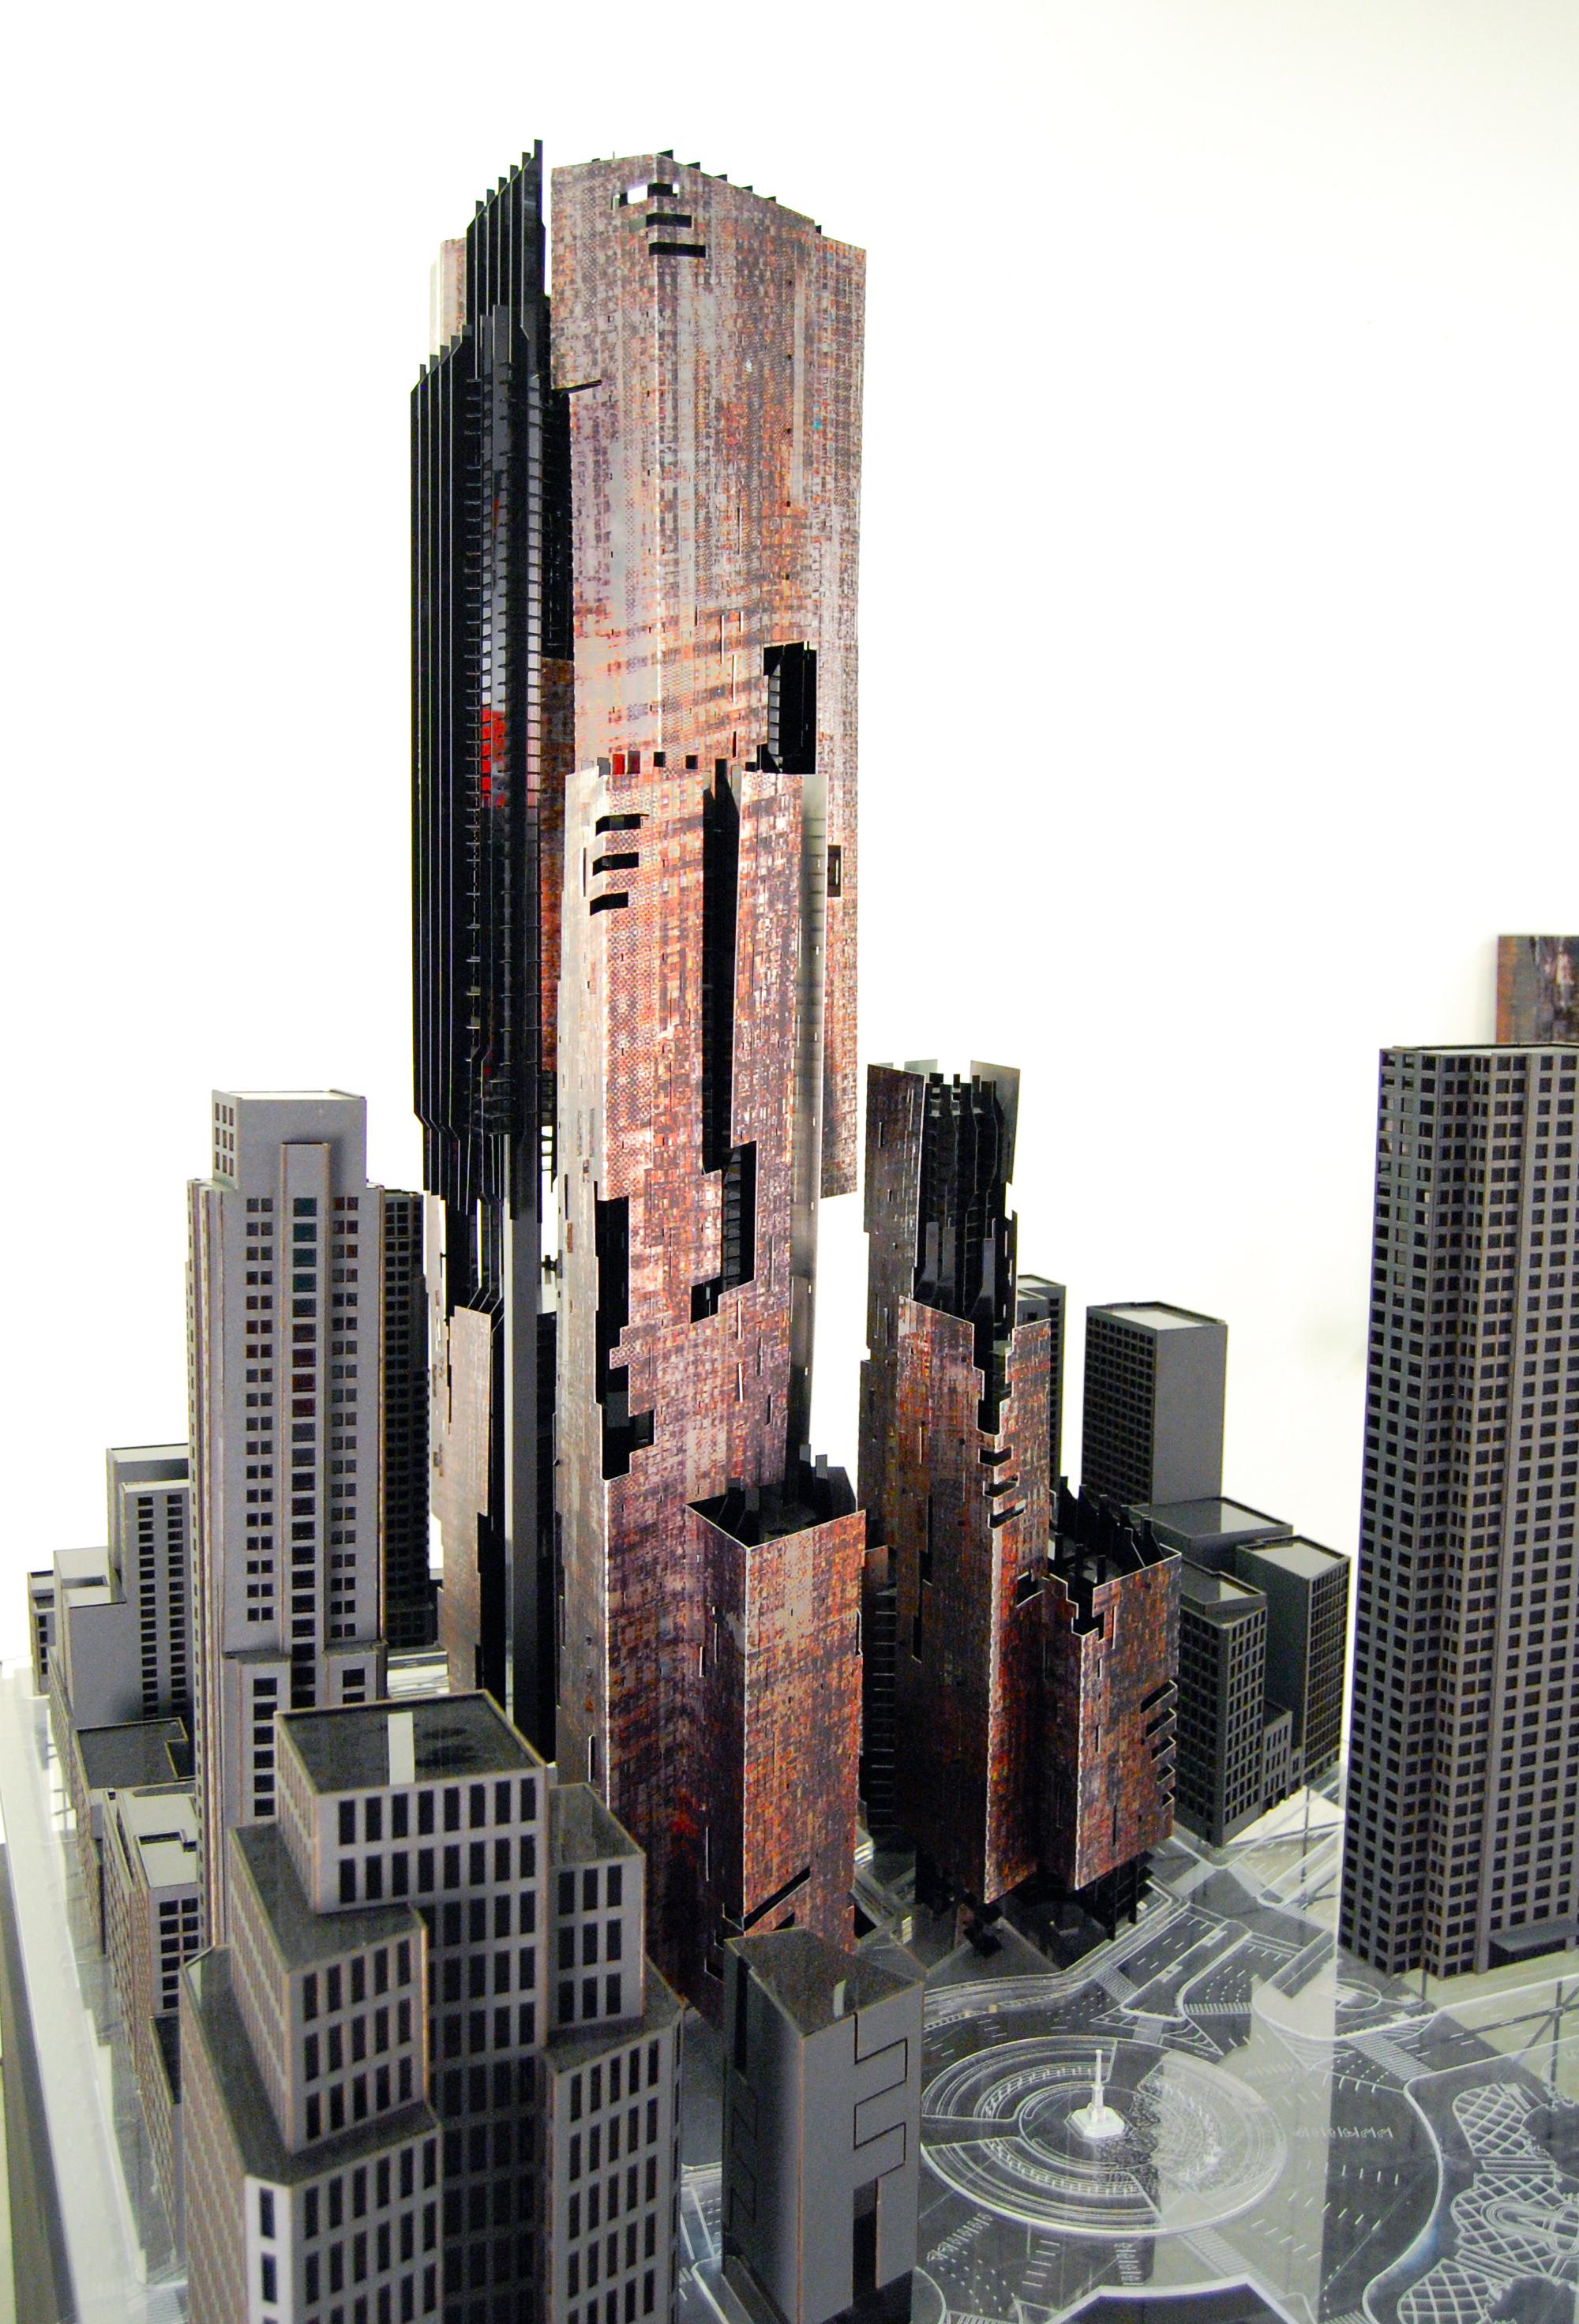 _model scale: 1/300